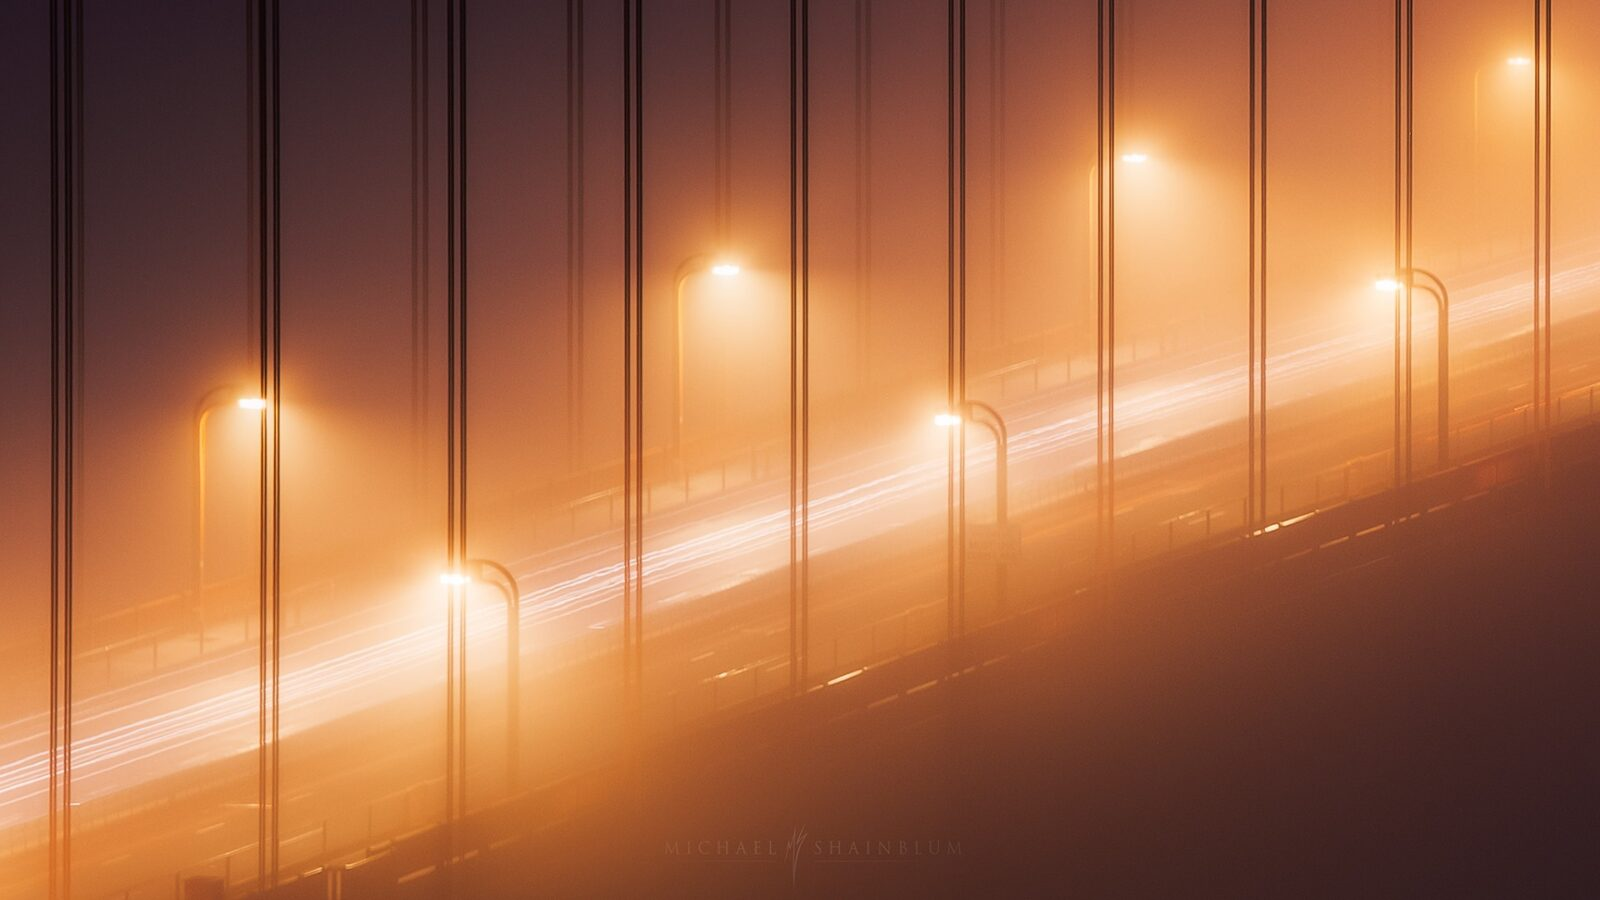 San Francisco Shrouded in Dense Fog Captured by Michael Shainblum